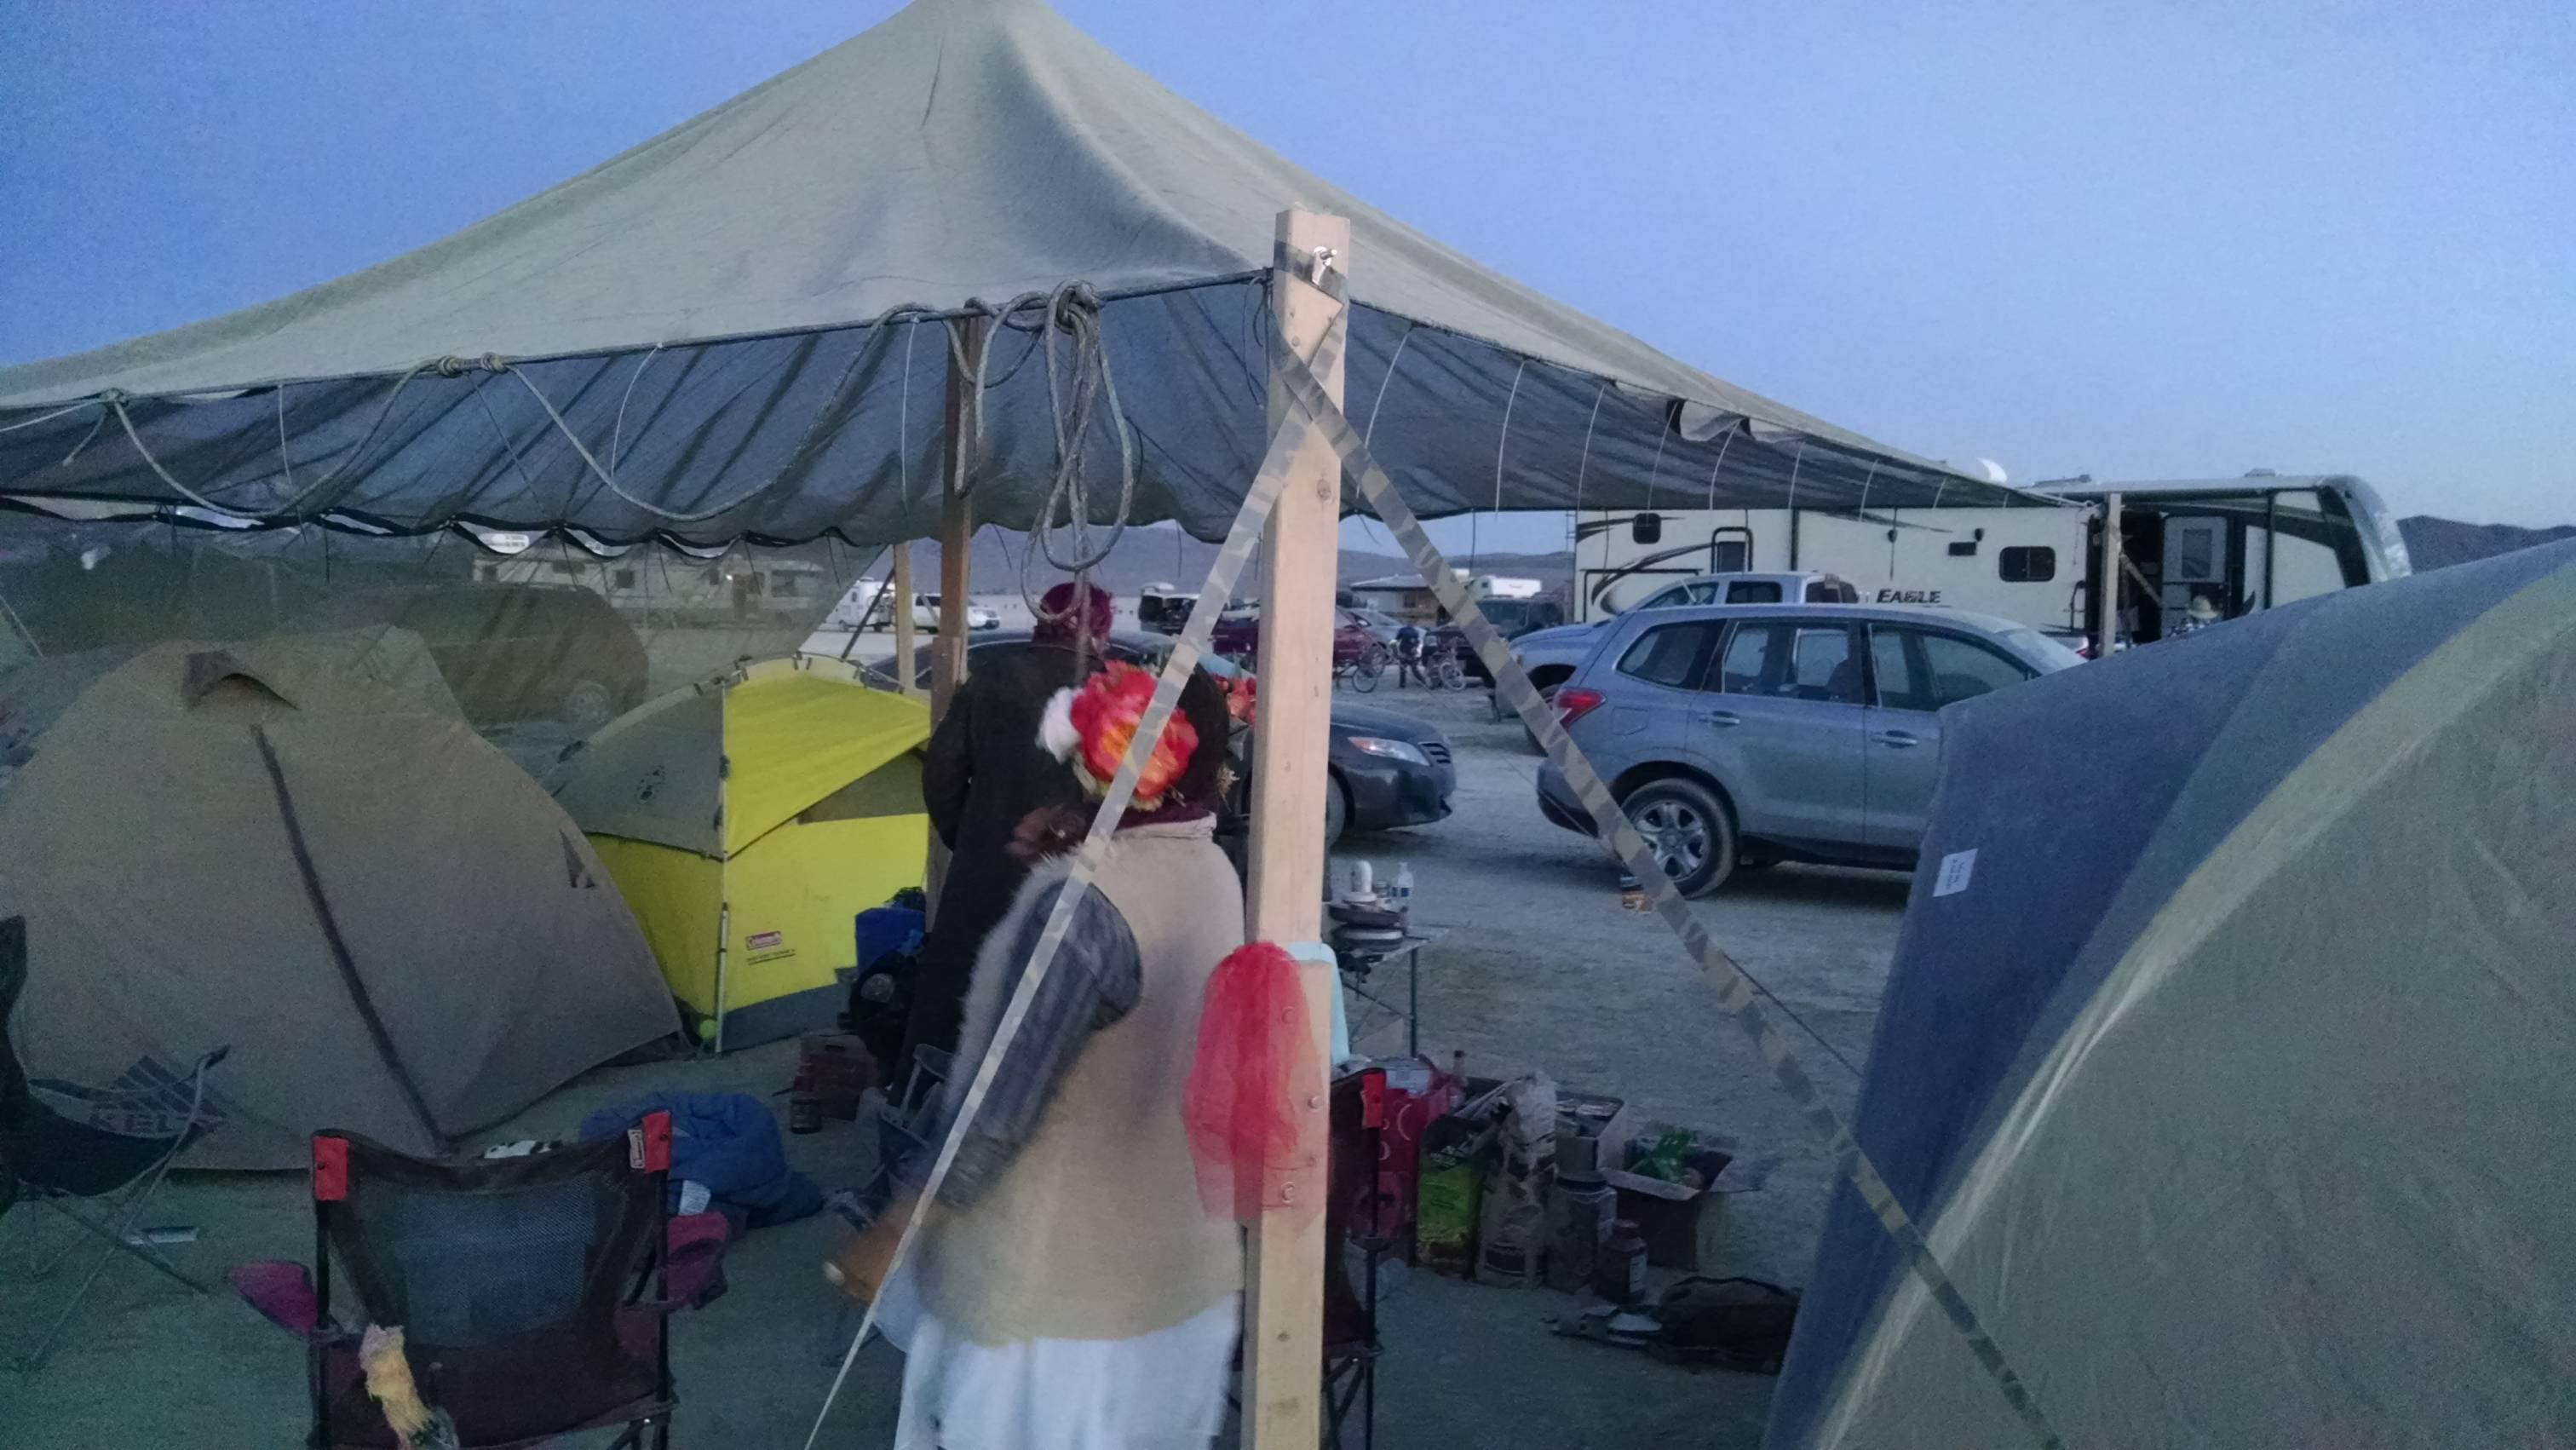 Burning Man Shade Structure | AFTbit